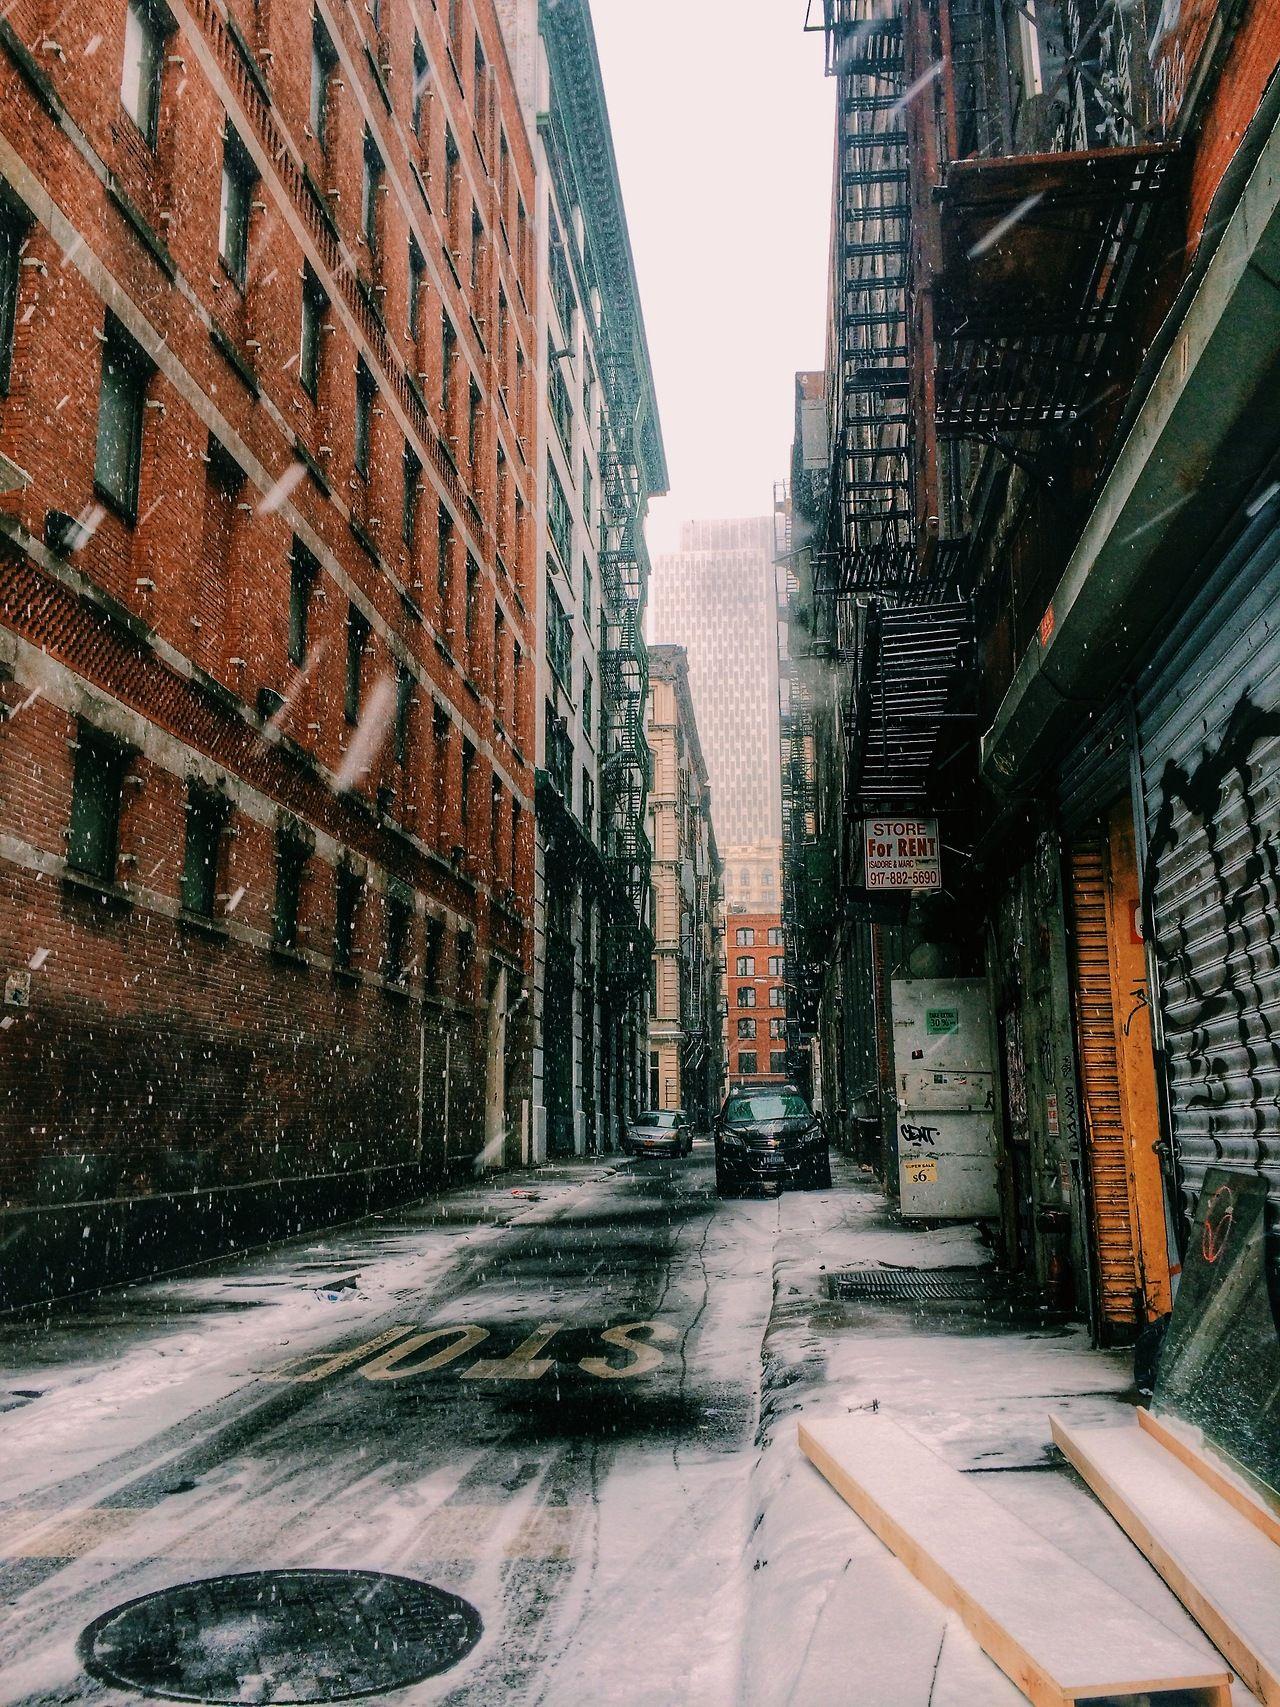 Snowy City Street City Streets Photography Urban Landscape Landscape Photography